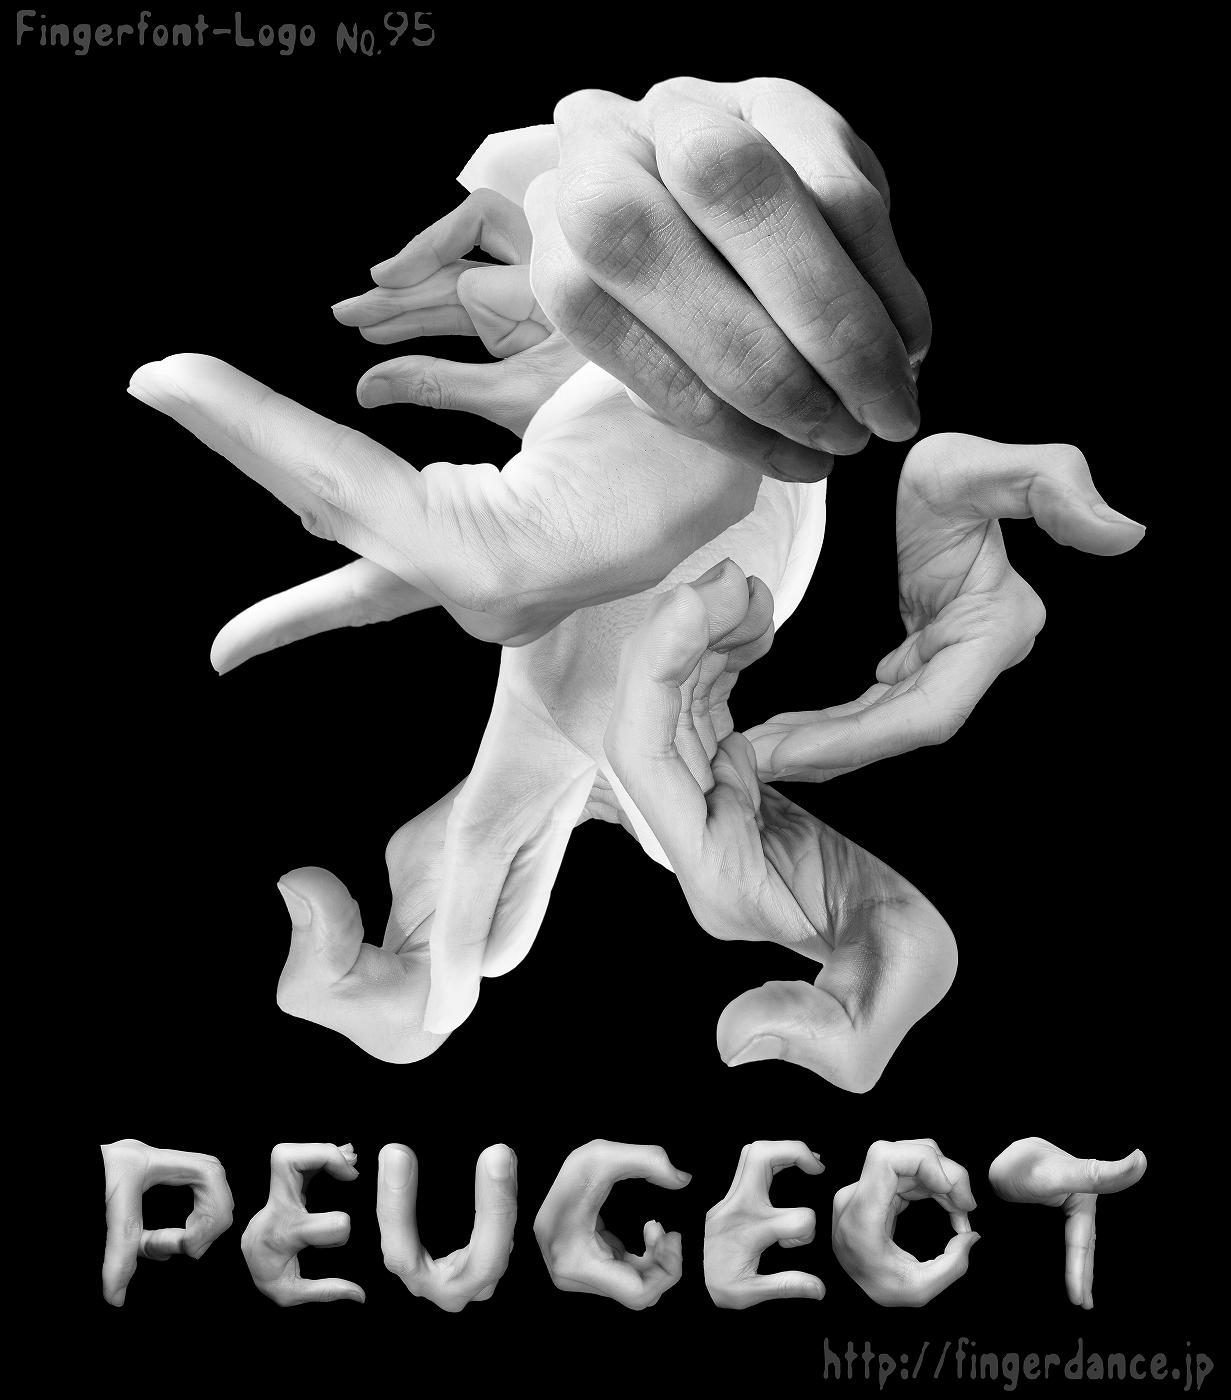 Peugeot-fingerhttp://fingerdance.jp/L/logohand プジョー・フィンガーロゴハンド手指